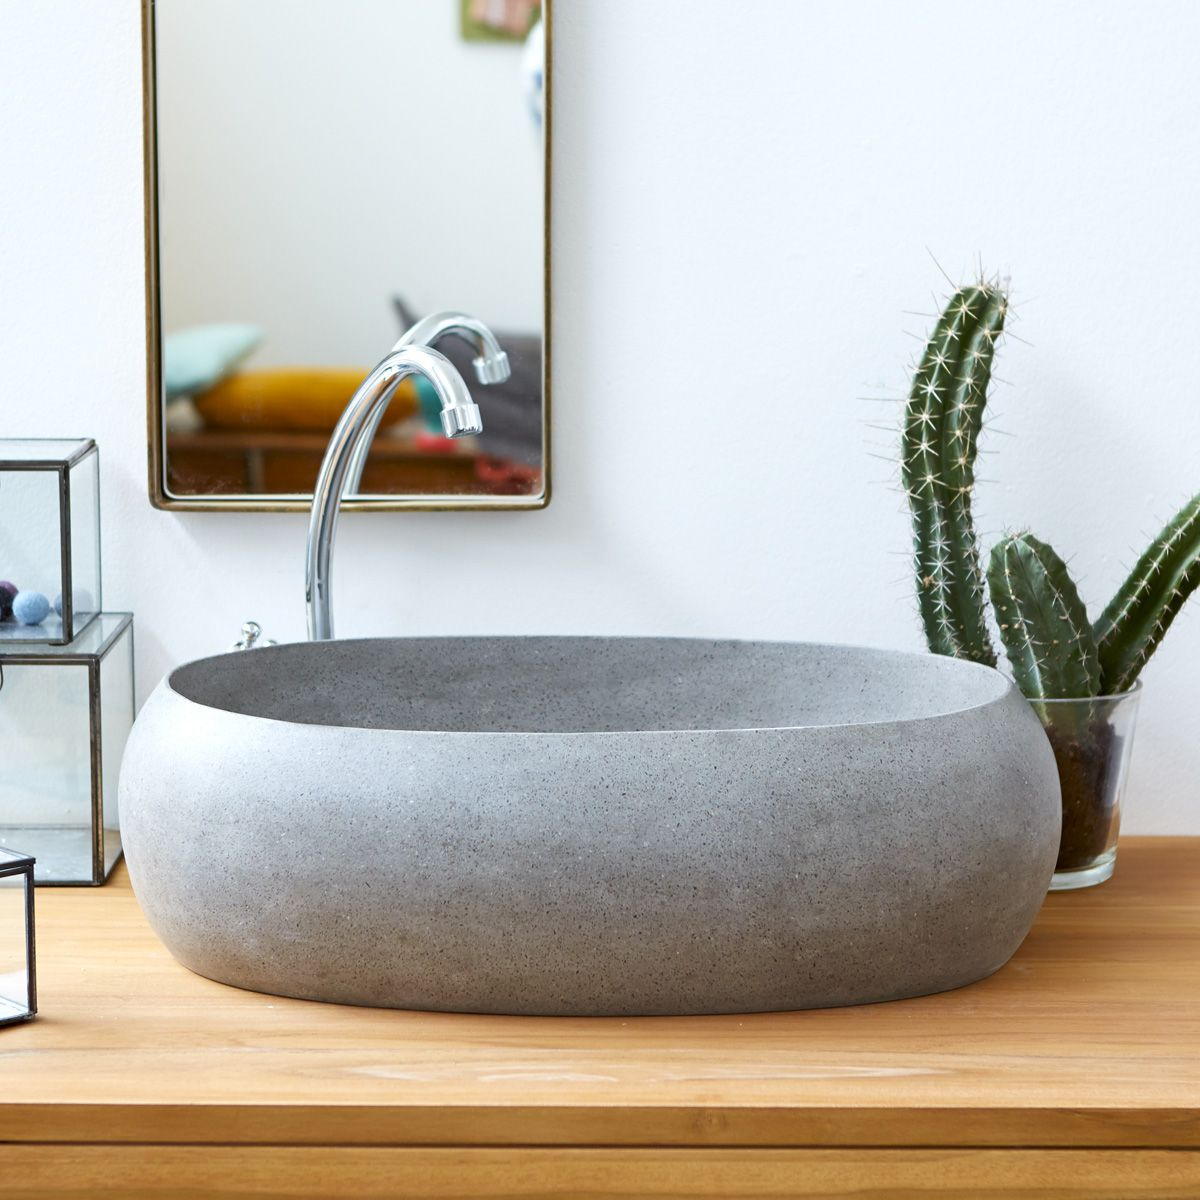 Waschbecken Terrazzo Orion 55 Grau Bathroom Pinterest Terrazzo